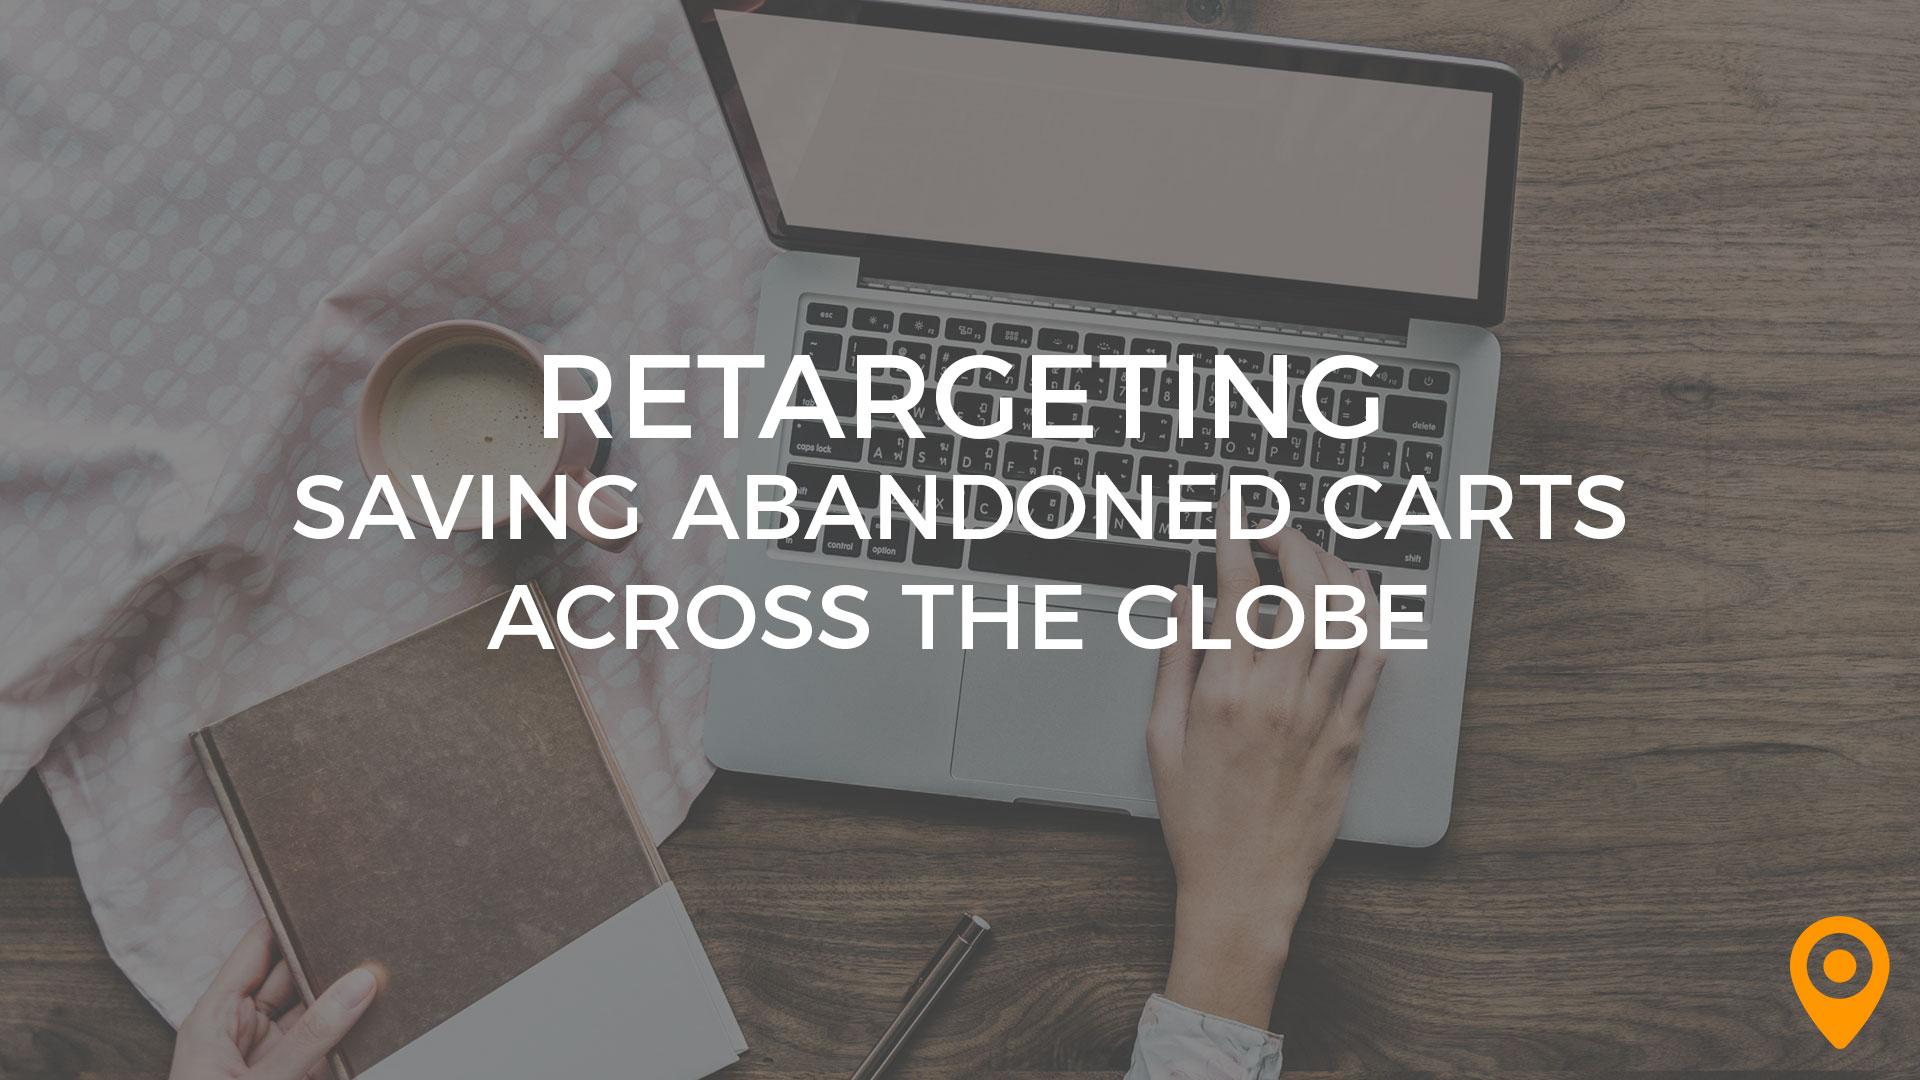 Retargeting Saving Abandoned Carts Across the Globe